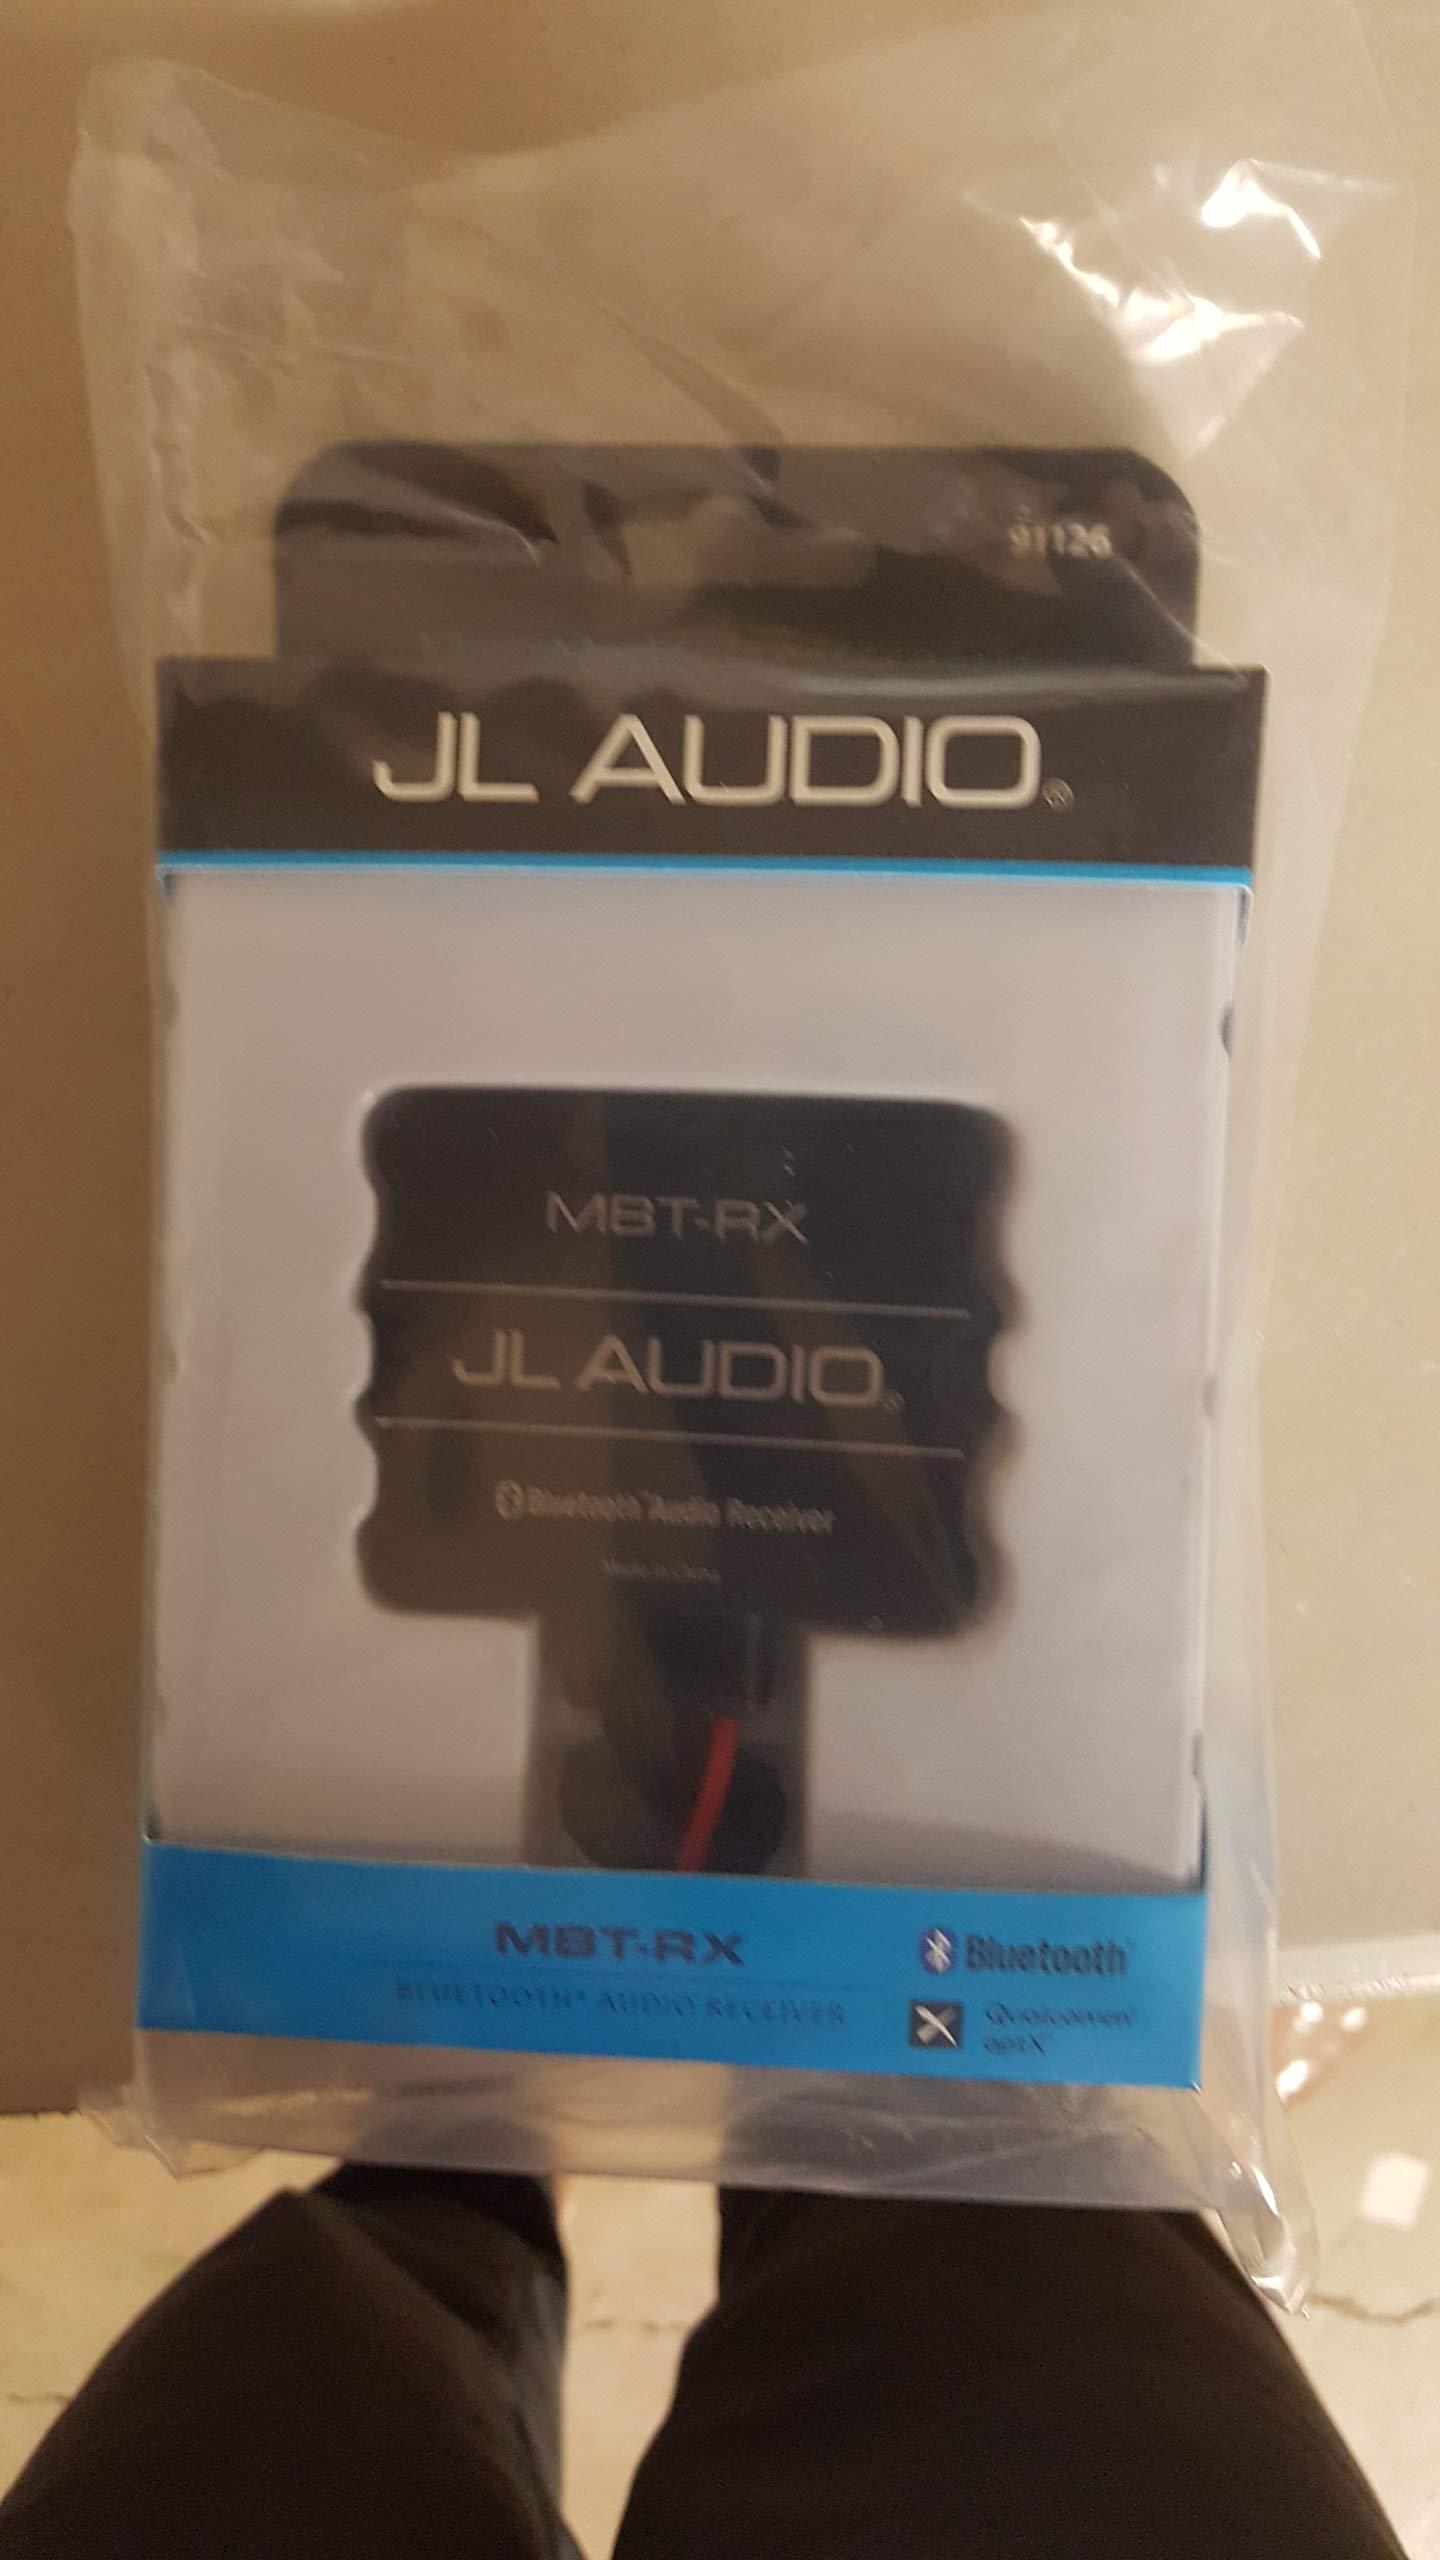 JL Audio MBT-RX Bluetooth Audio Receiver by JL AUDIO